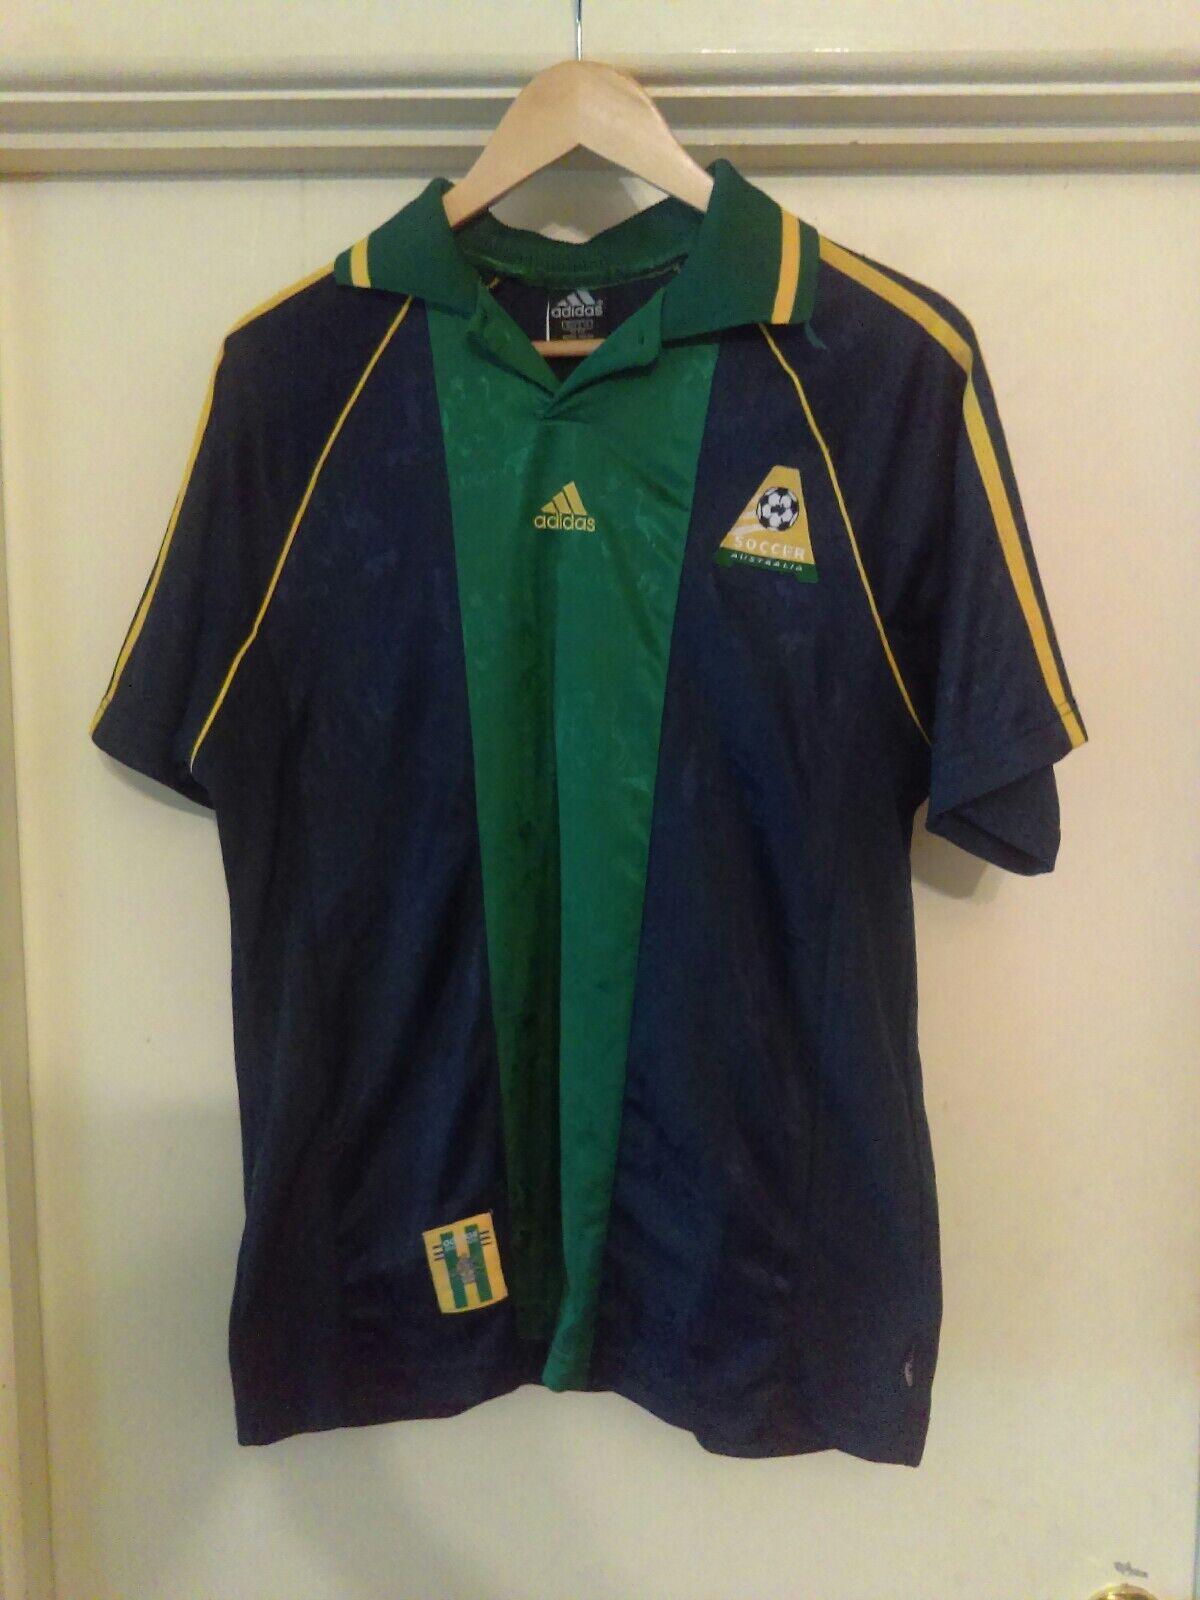 c7394fd85b3 90s boys size 14 socceroos jersey. Made in Australia adidas Vintage ...